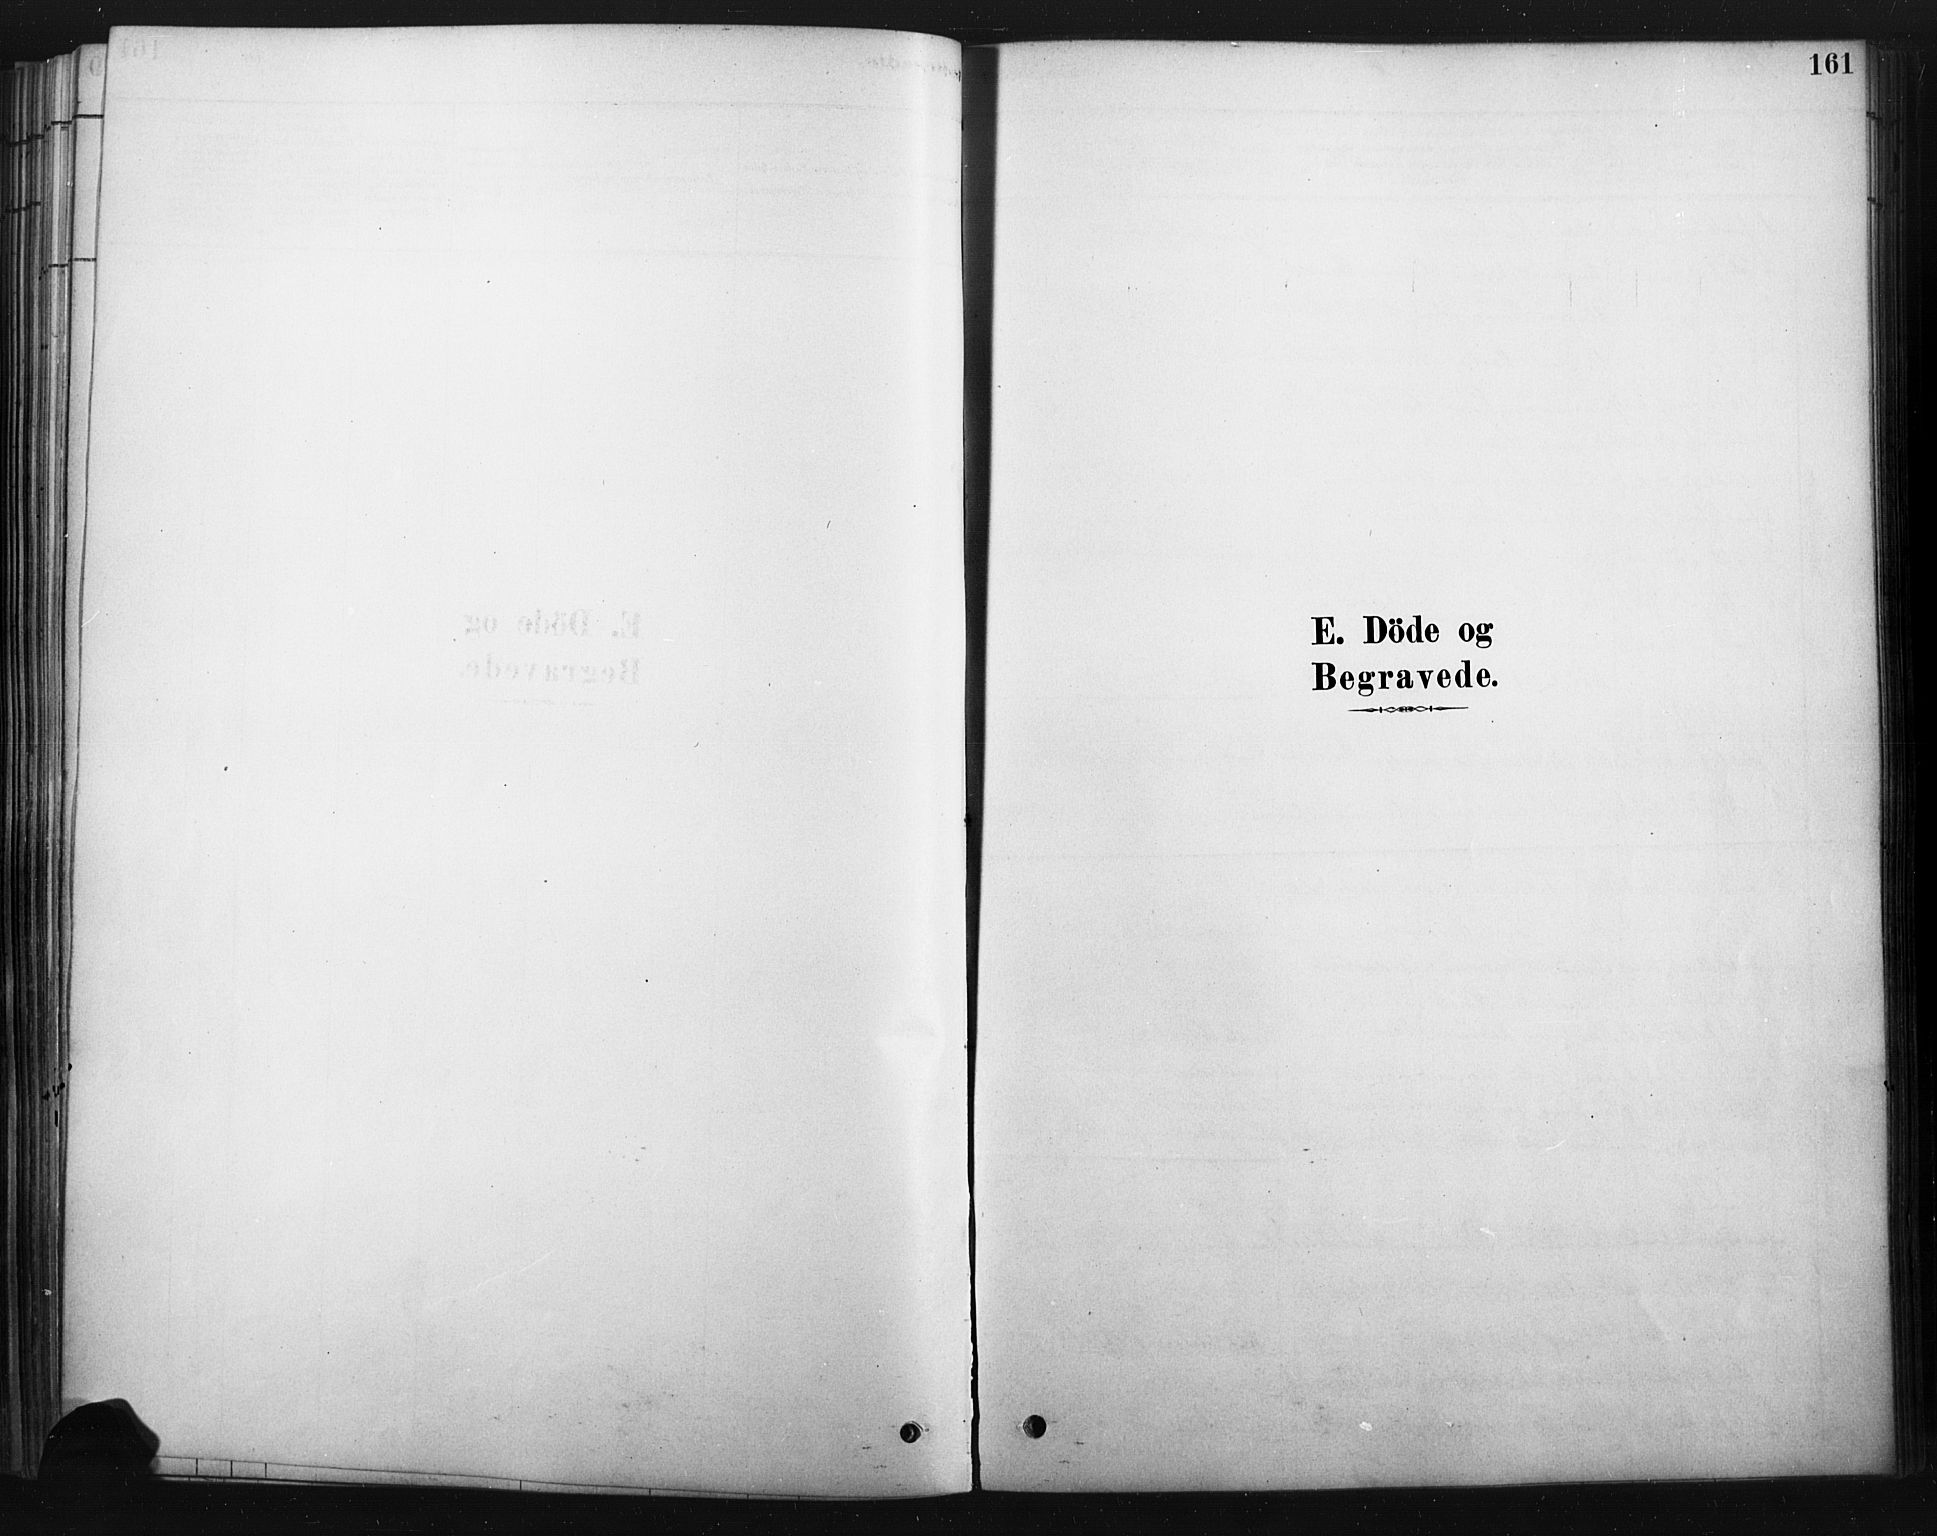 SAH, Rendalen prestekontor, H/Ha/Haa/L0010: Ministerialbok nr. 10, 1878-1901, s. 161